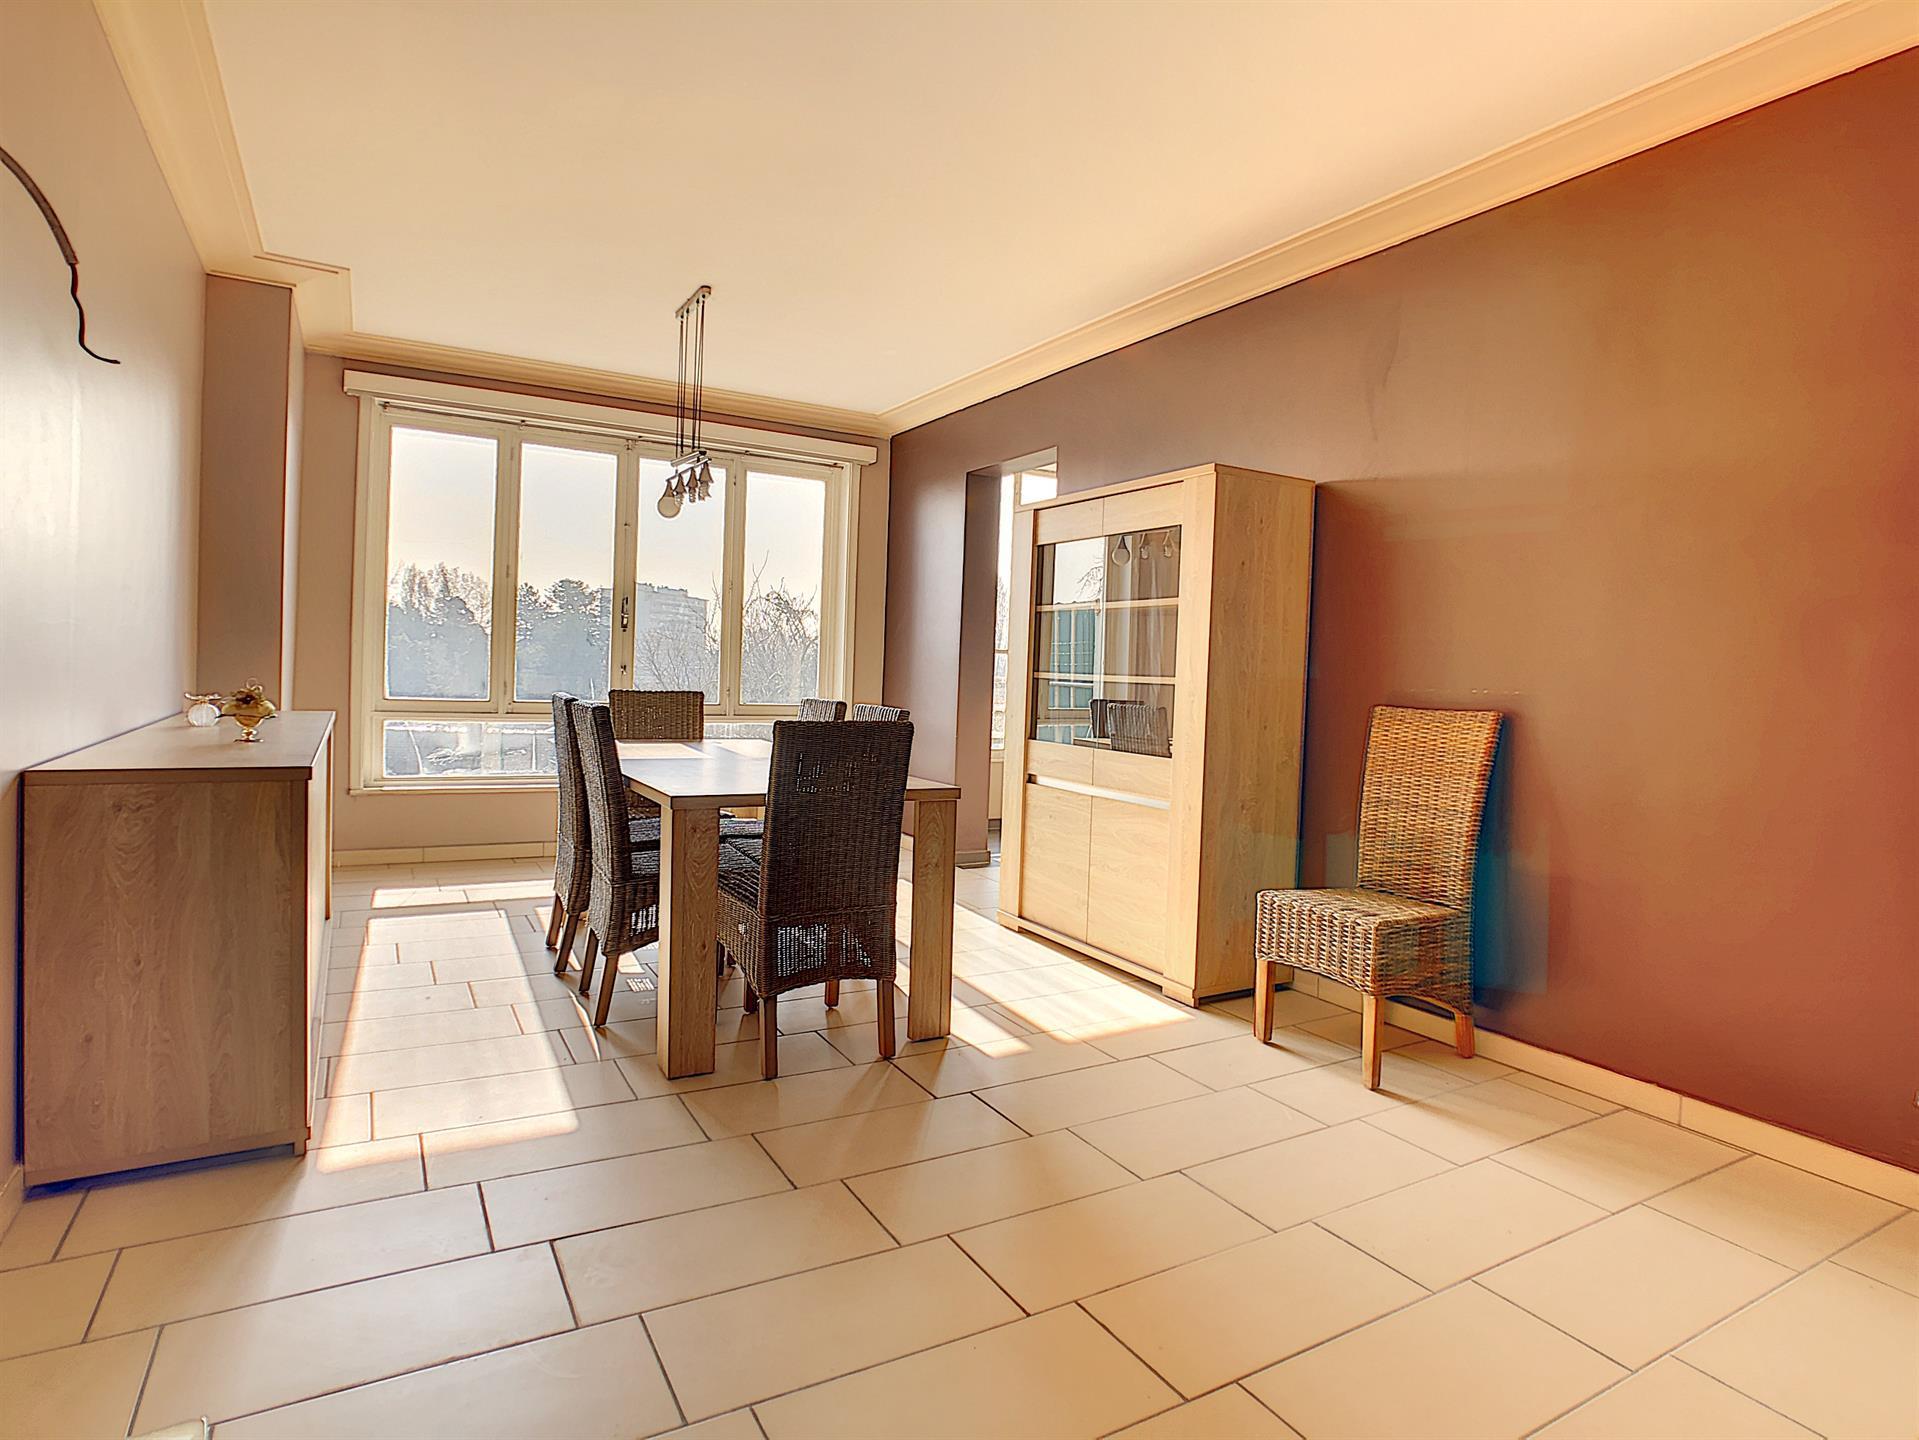 Appartement - Anderlecht - #4303021-0